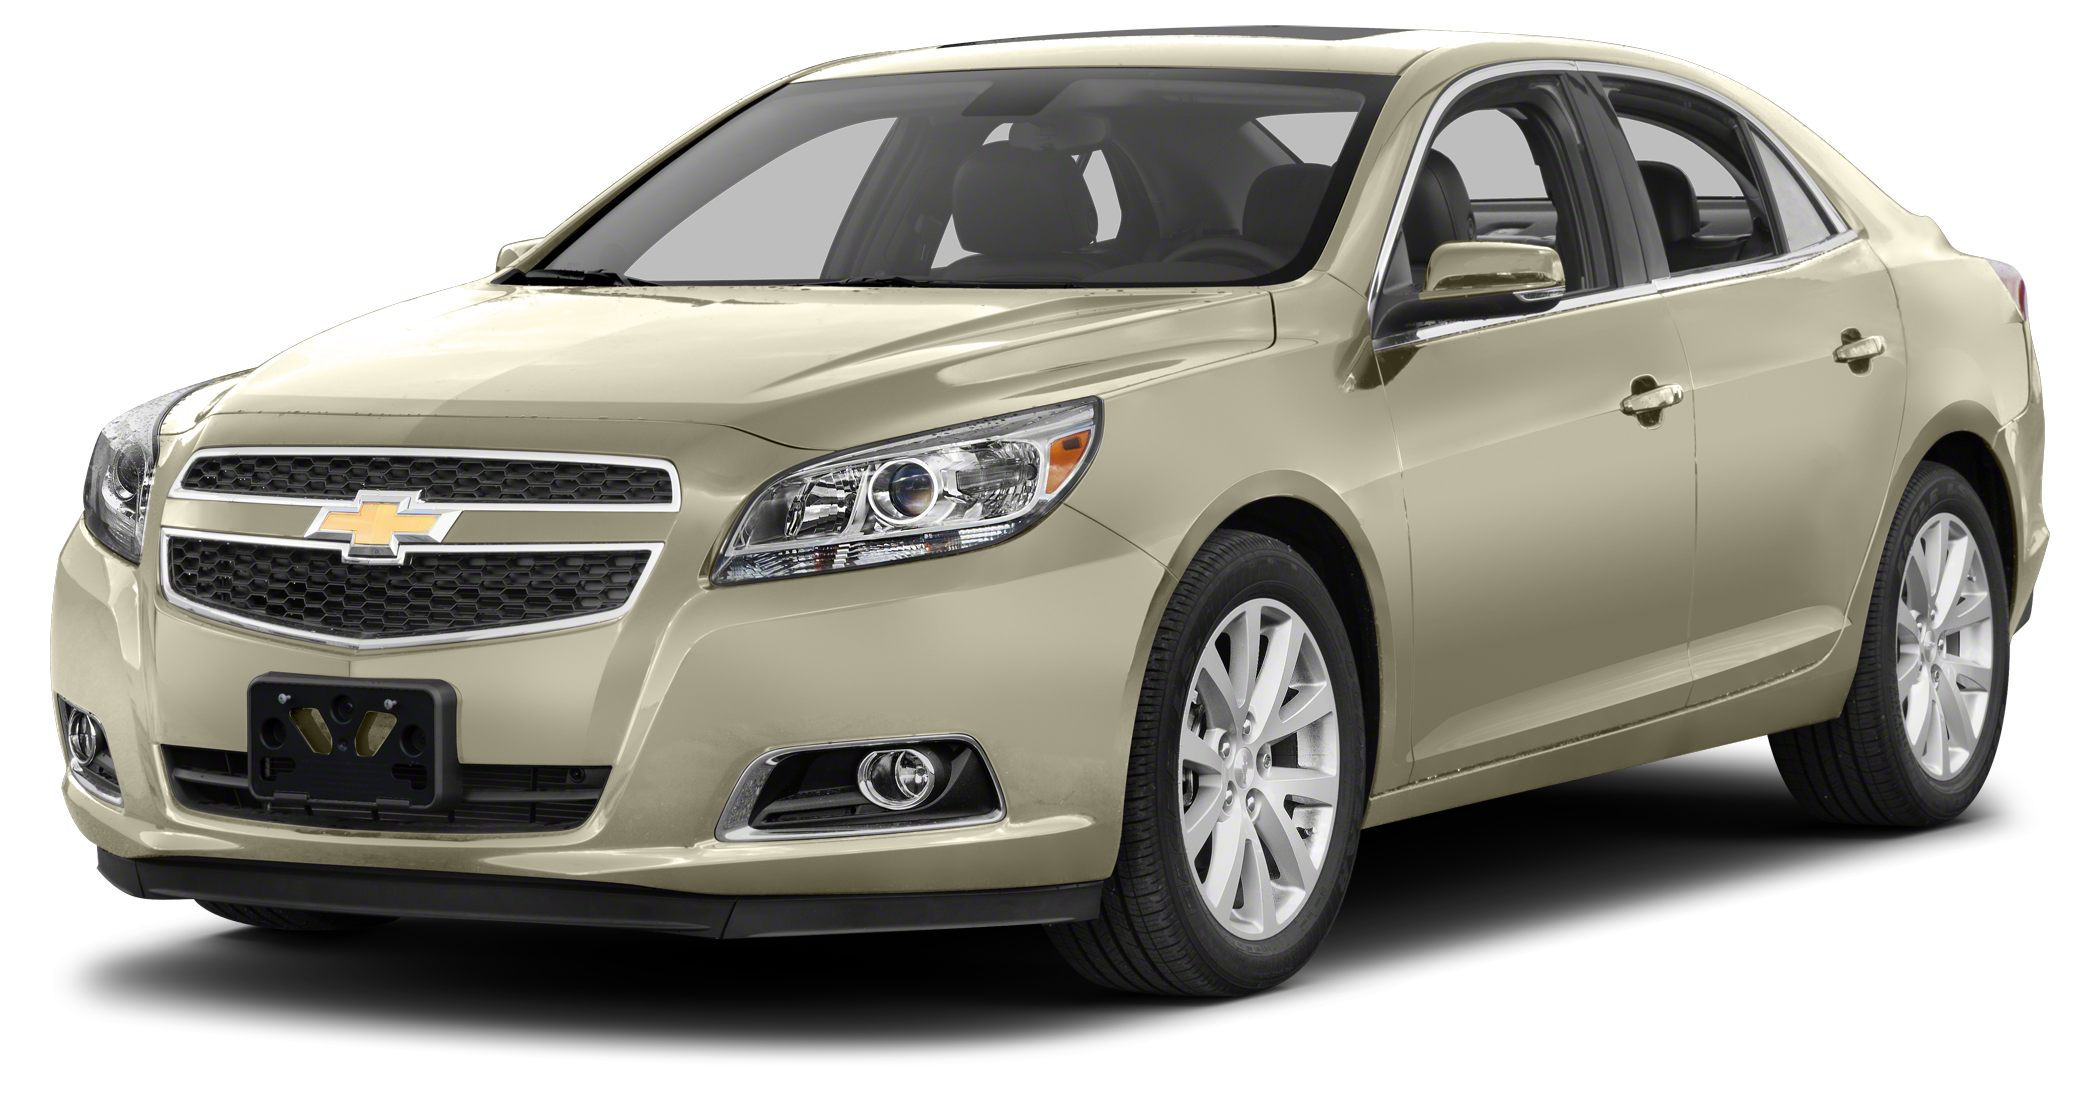 2013 Chevrolet Malibu LS w1LS LOW MILES CHEVROLET WARRANTY 1 OWNER CARFAX CERTIFIED BLU